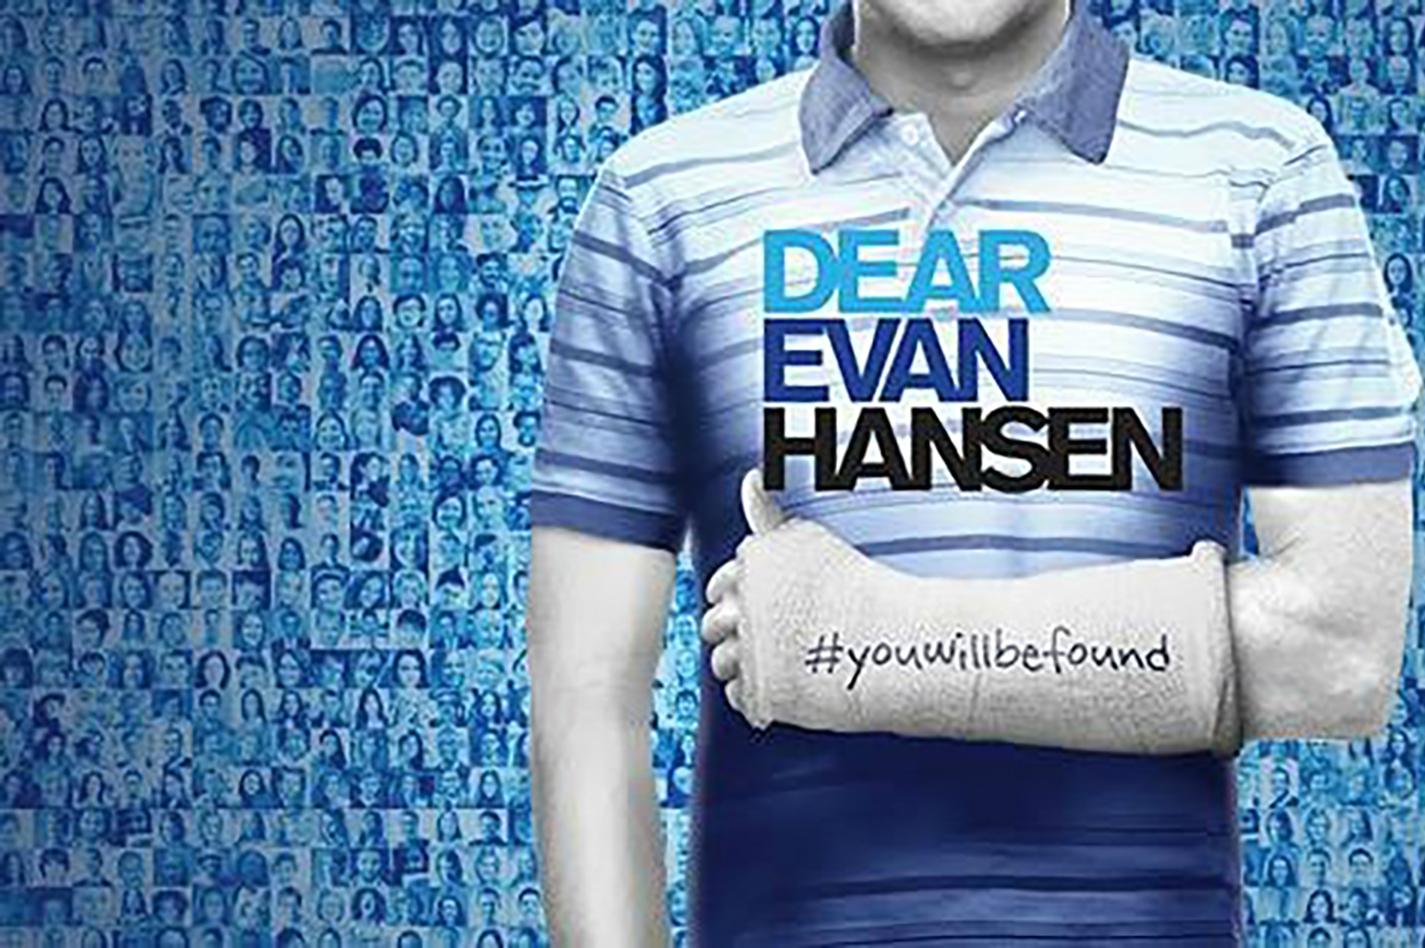 Dear-Evan-Hansen-Imagery.jpg